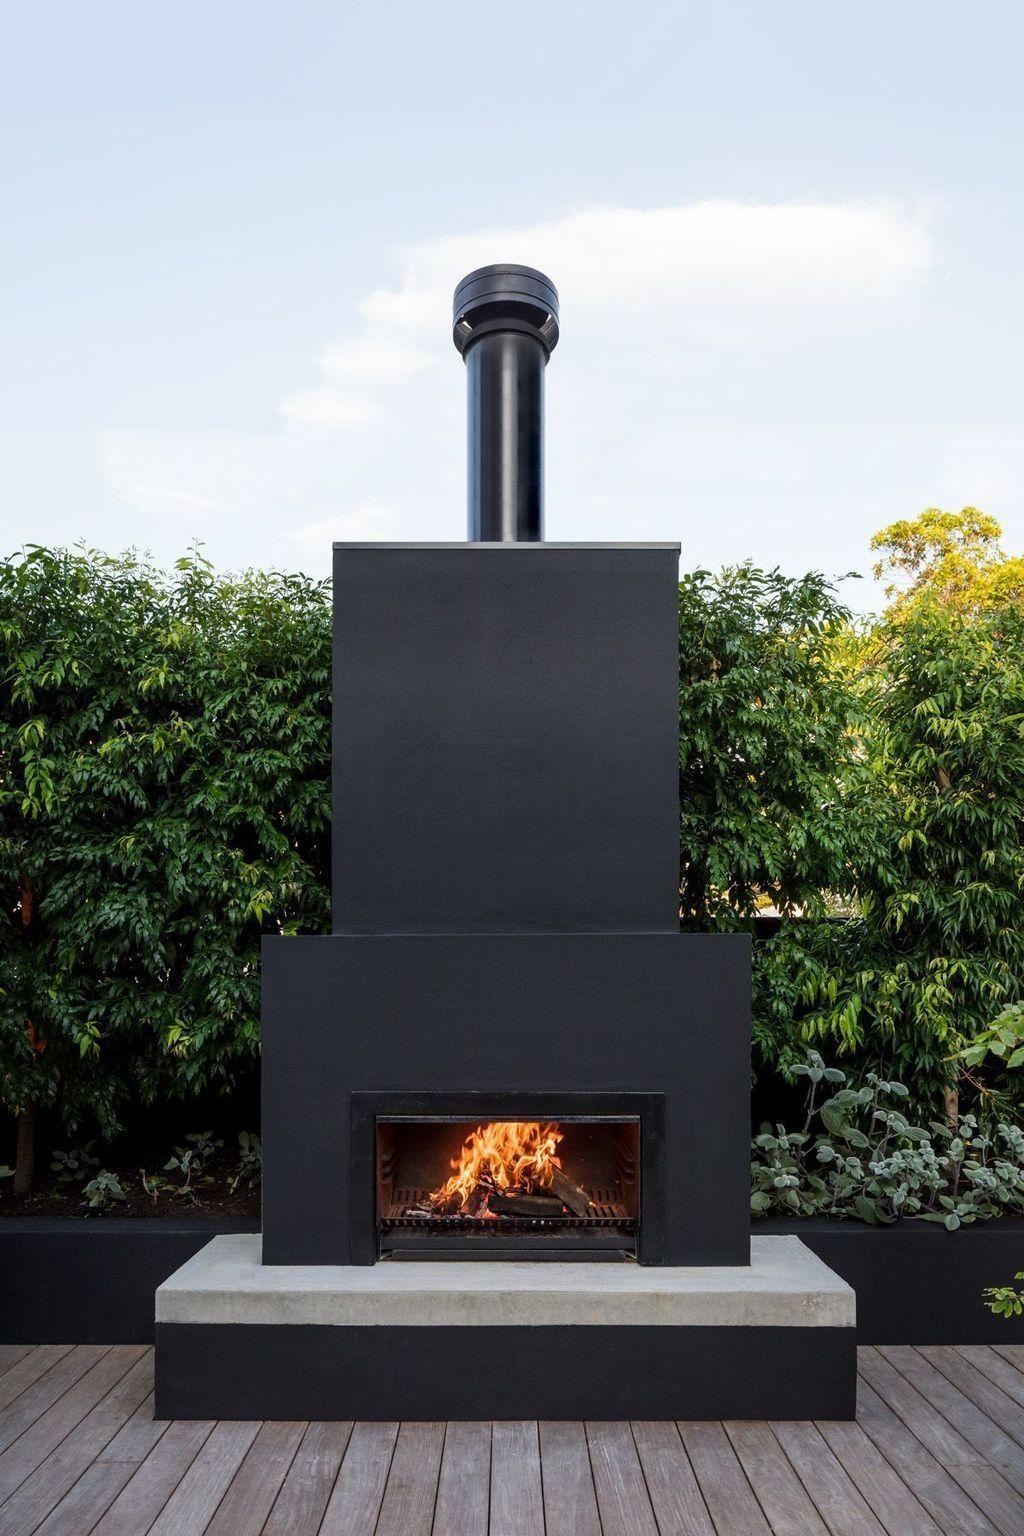 30 Wonderful Outdoor Fireplace Design Ideas Outdoor Fireplace Designs Diy Outdoor Fireplace Backyard Fireplace